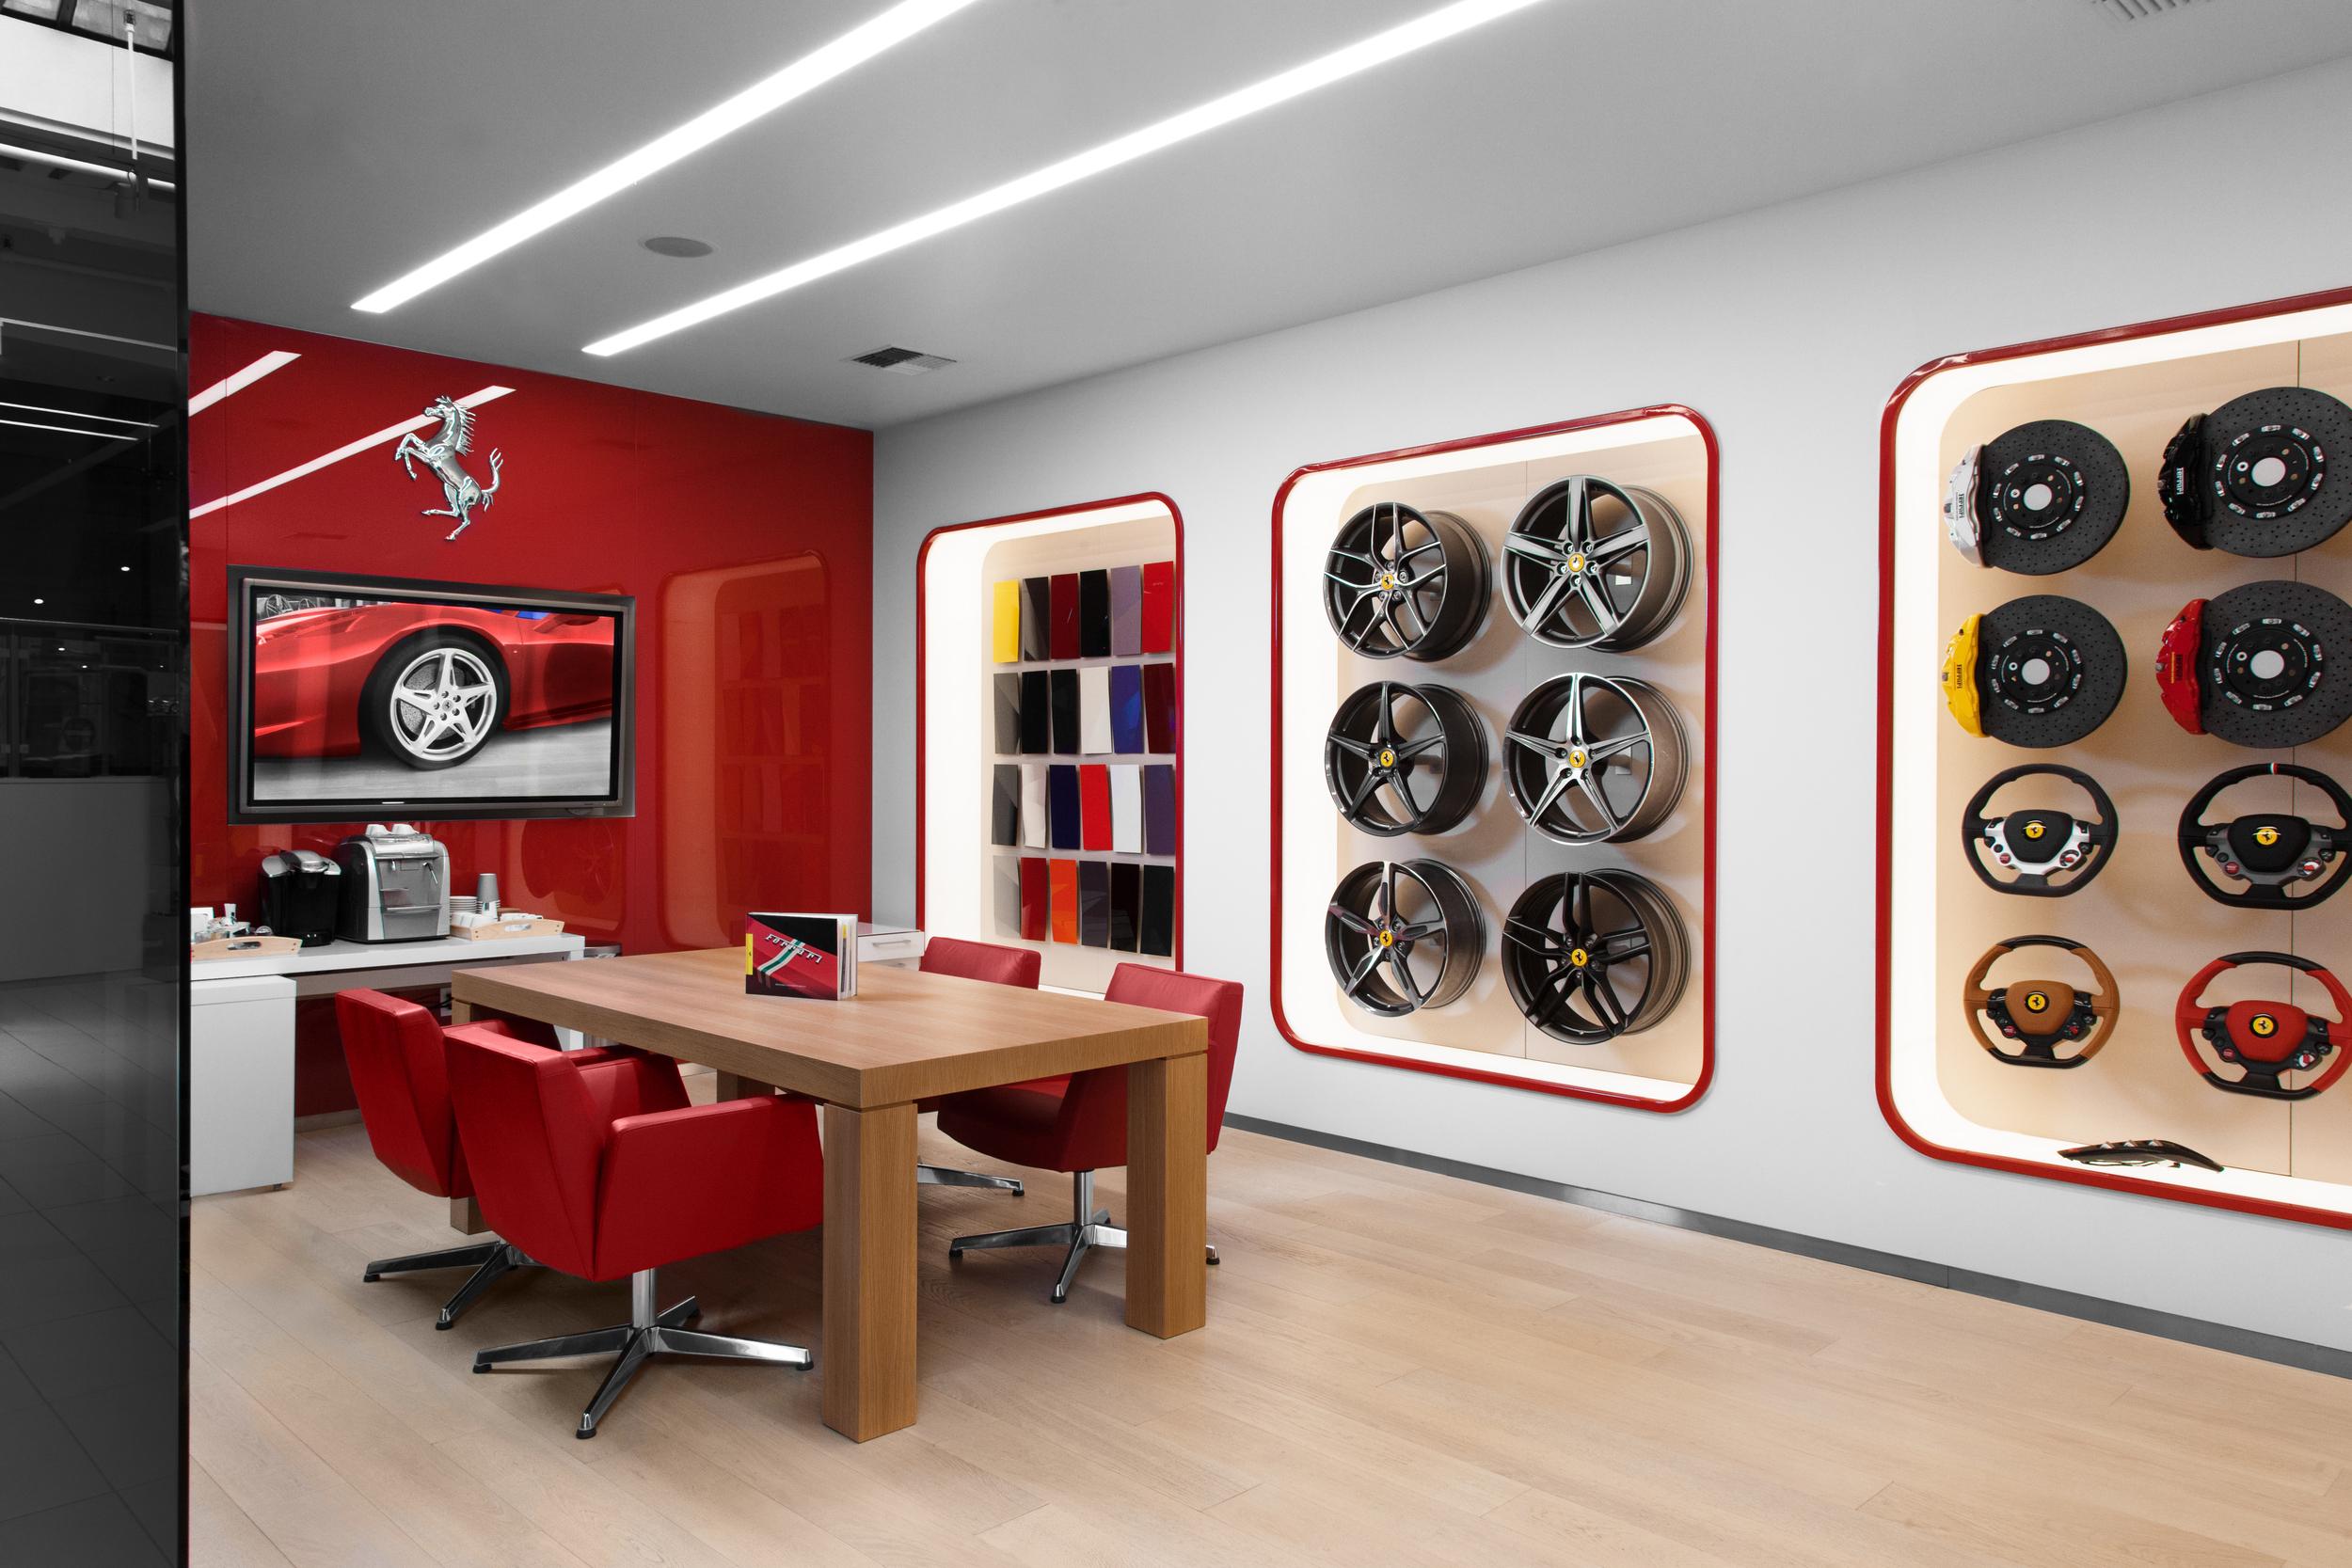 Maserati+of+seattle+-+Ferrari+1.jpg